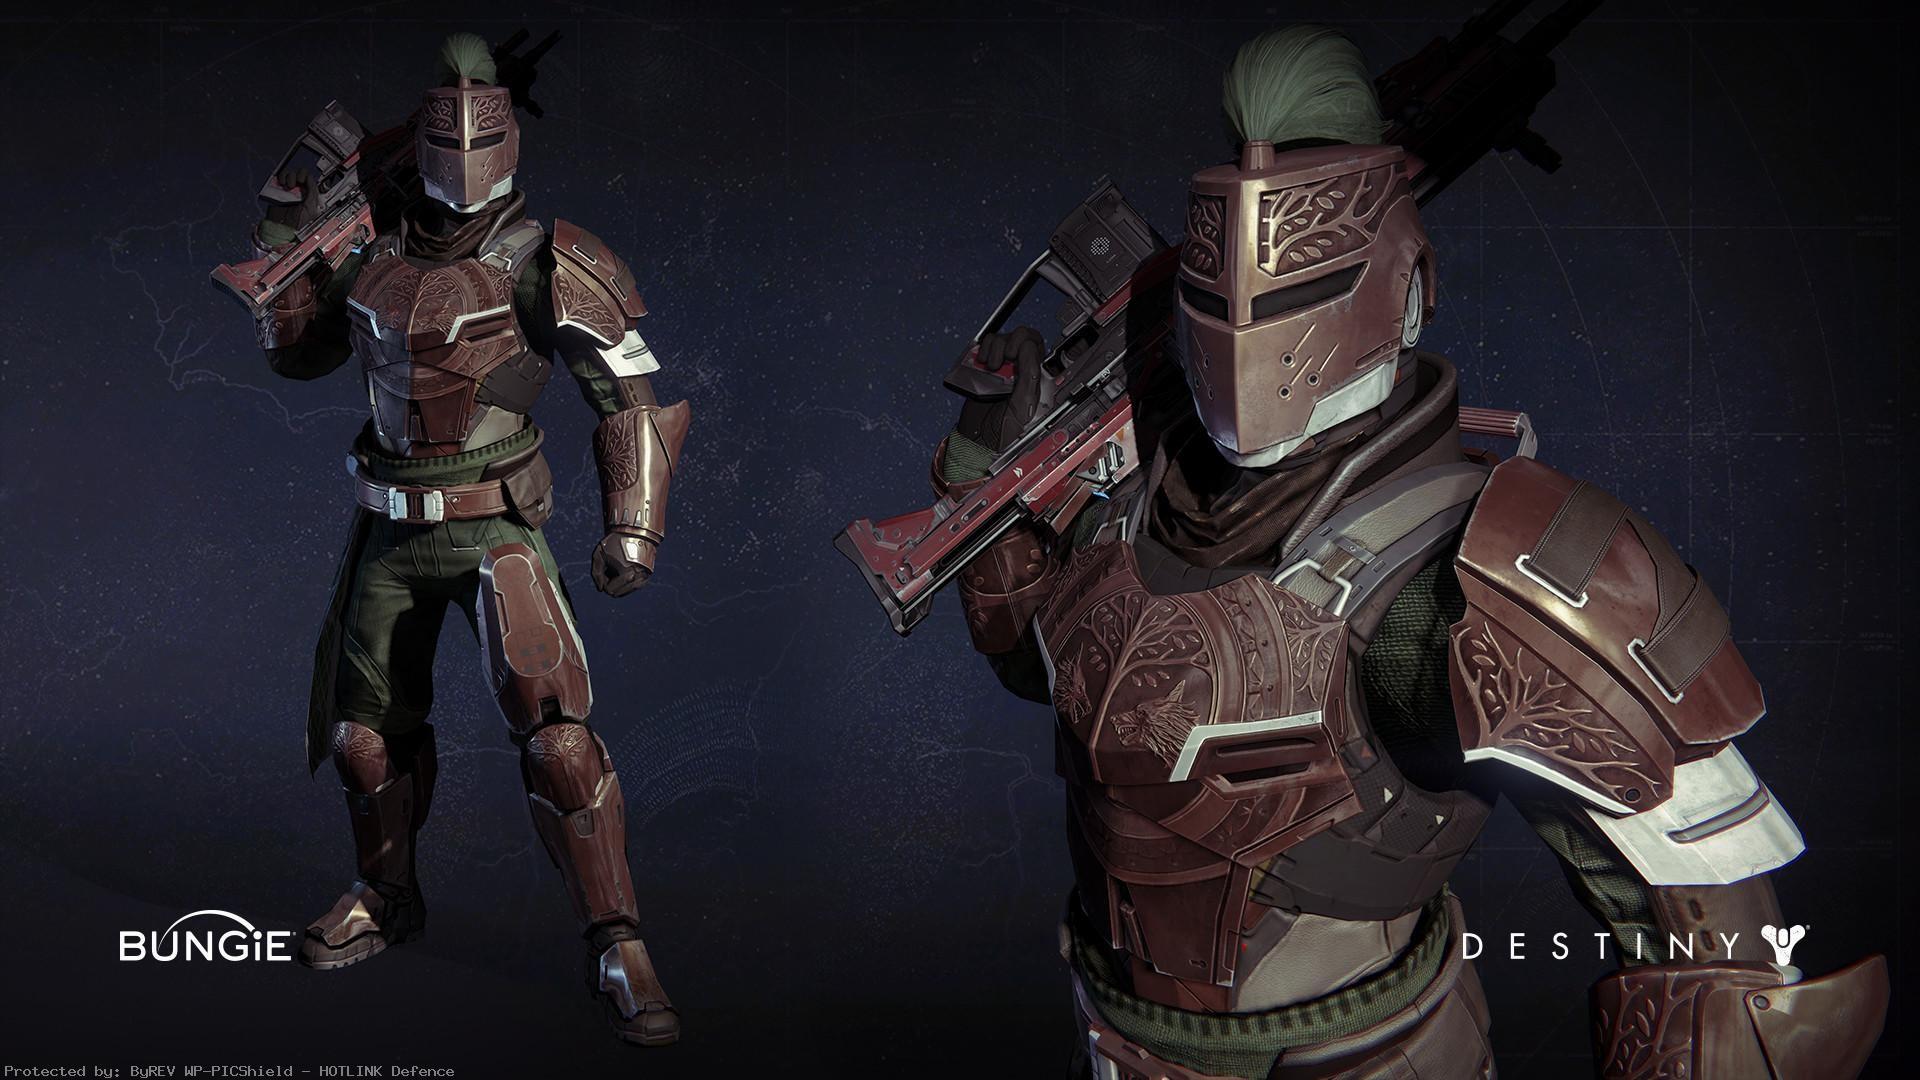 ArtStation-Destiny-Titan-Iron-Banner-Armor-James-Yavorsky-